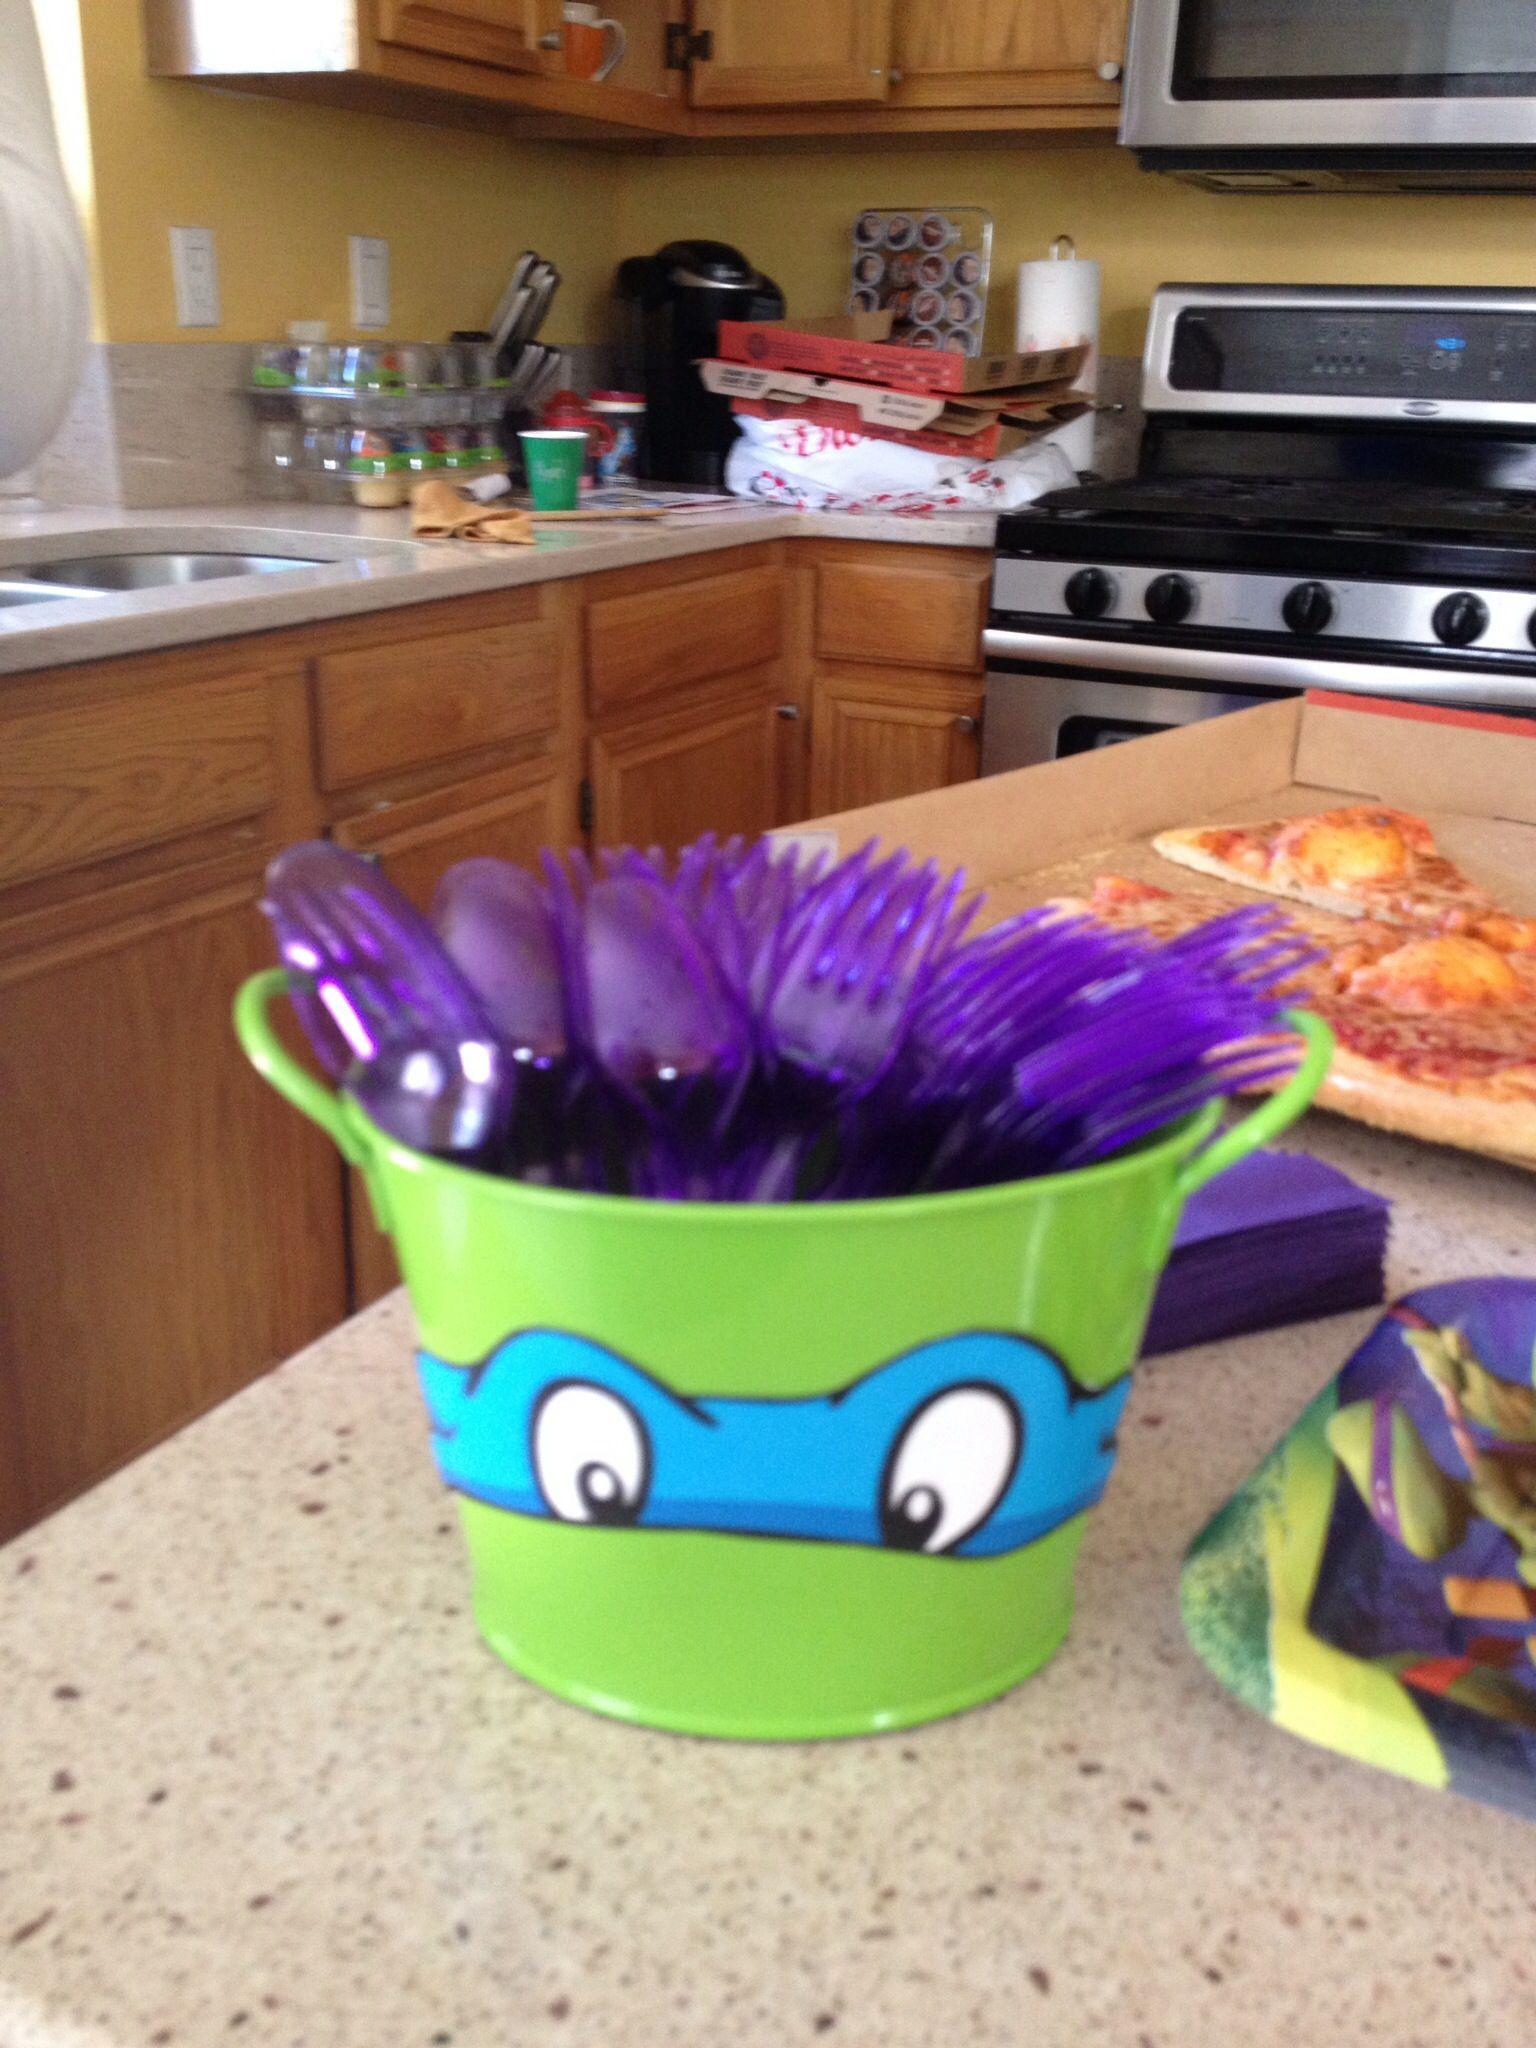 Ninja Turtle Birthday Party Food Ideas  My sons ninja turtle birthday party food decorations